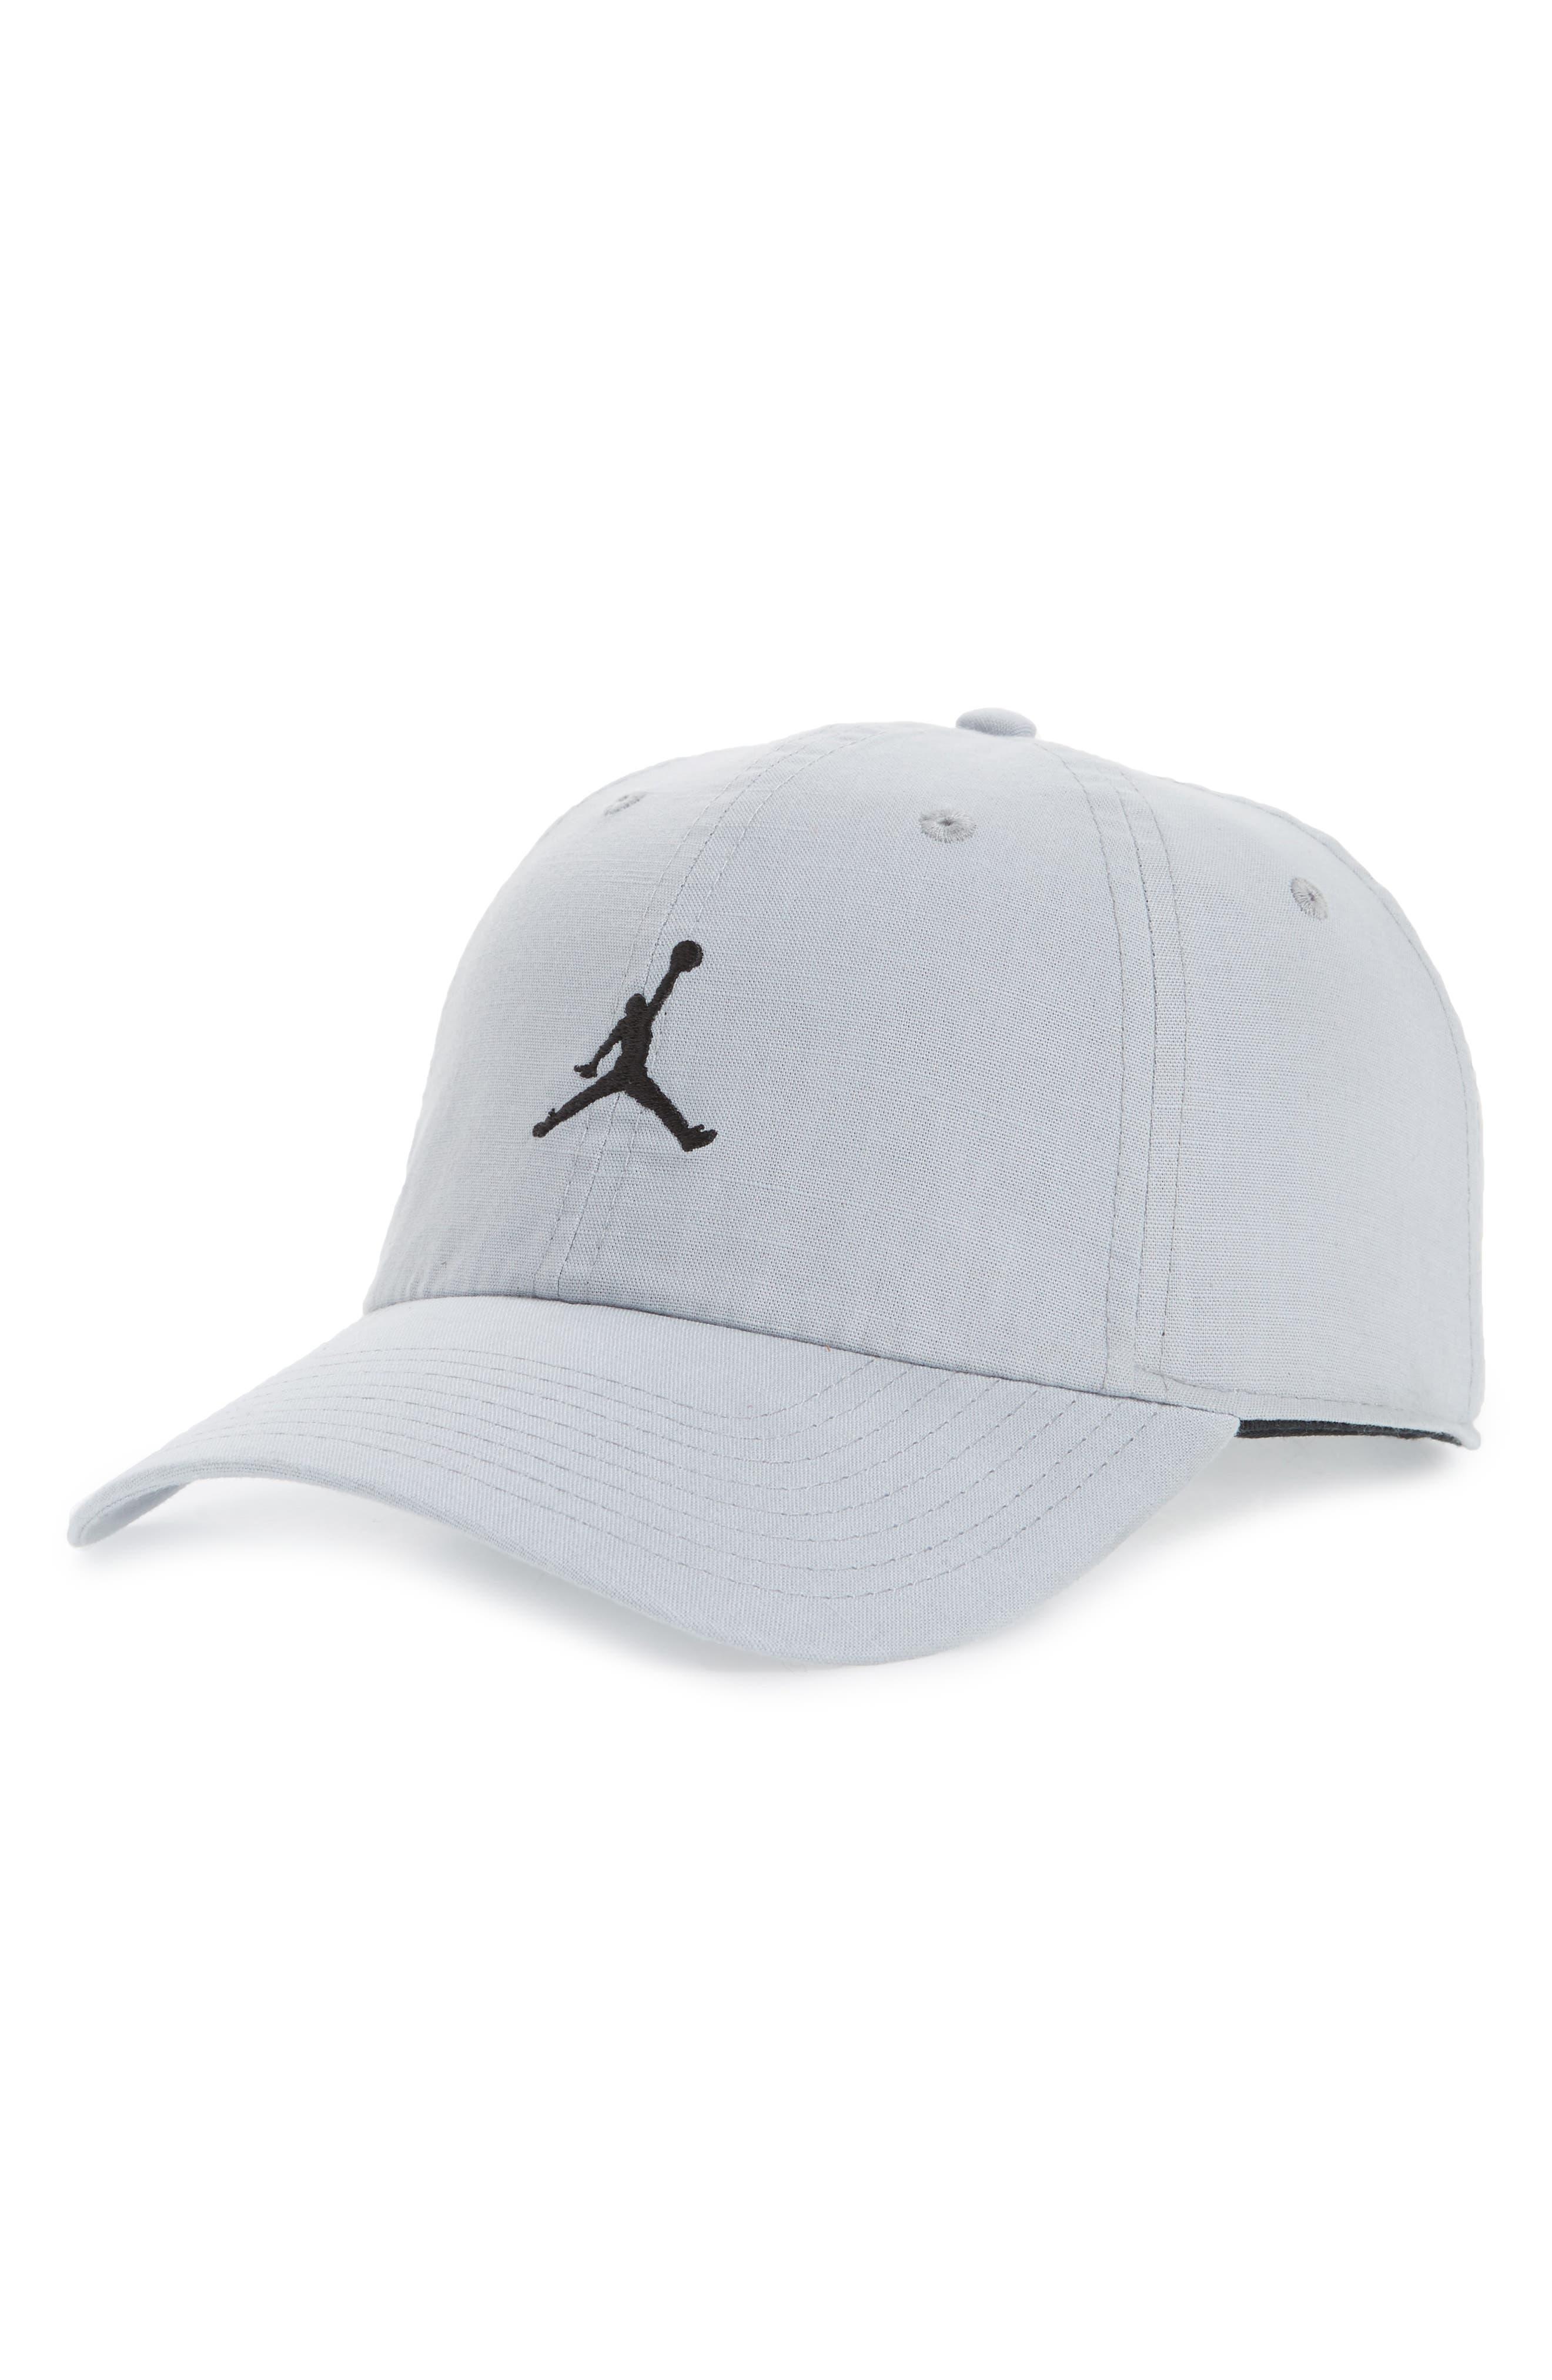 Nike Jordan H86 Jumpman Washed Baseball Cap